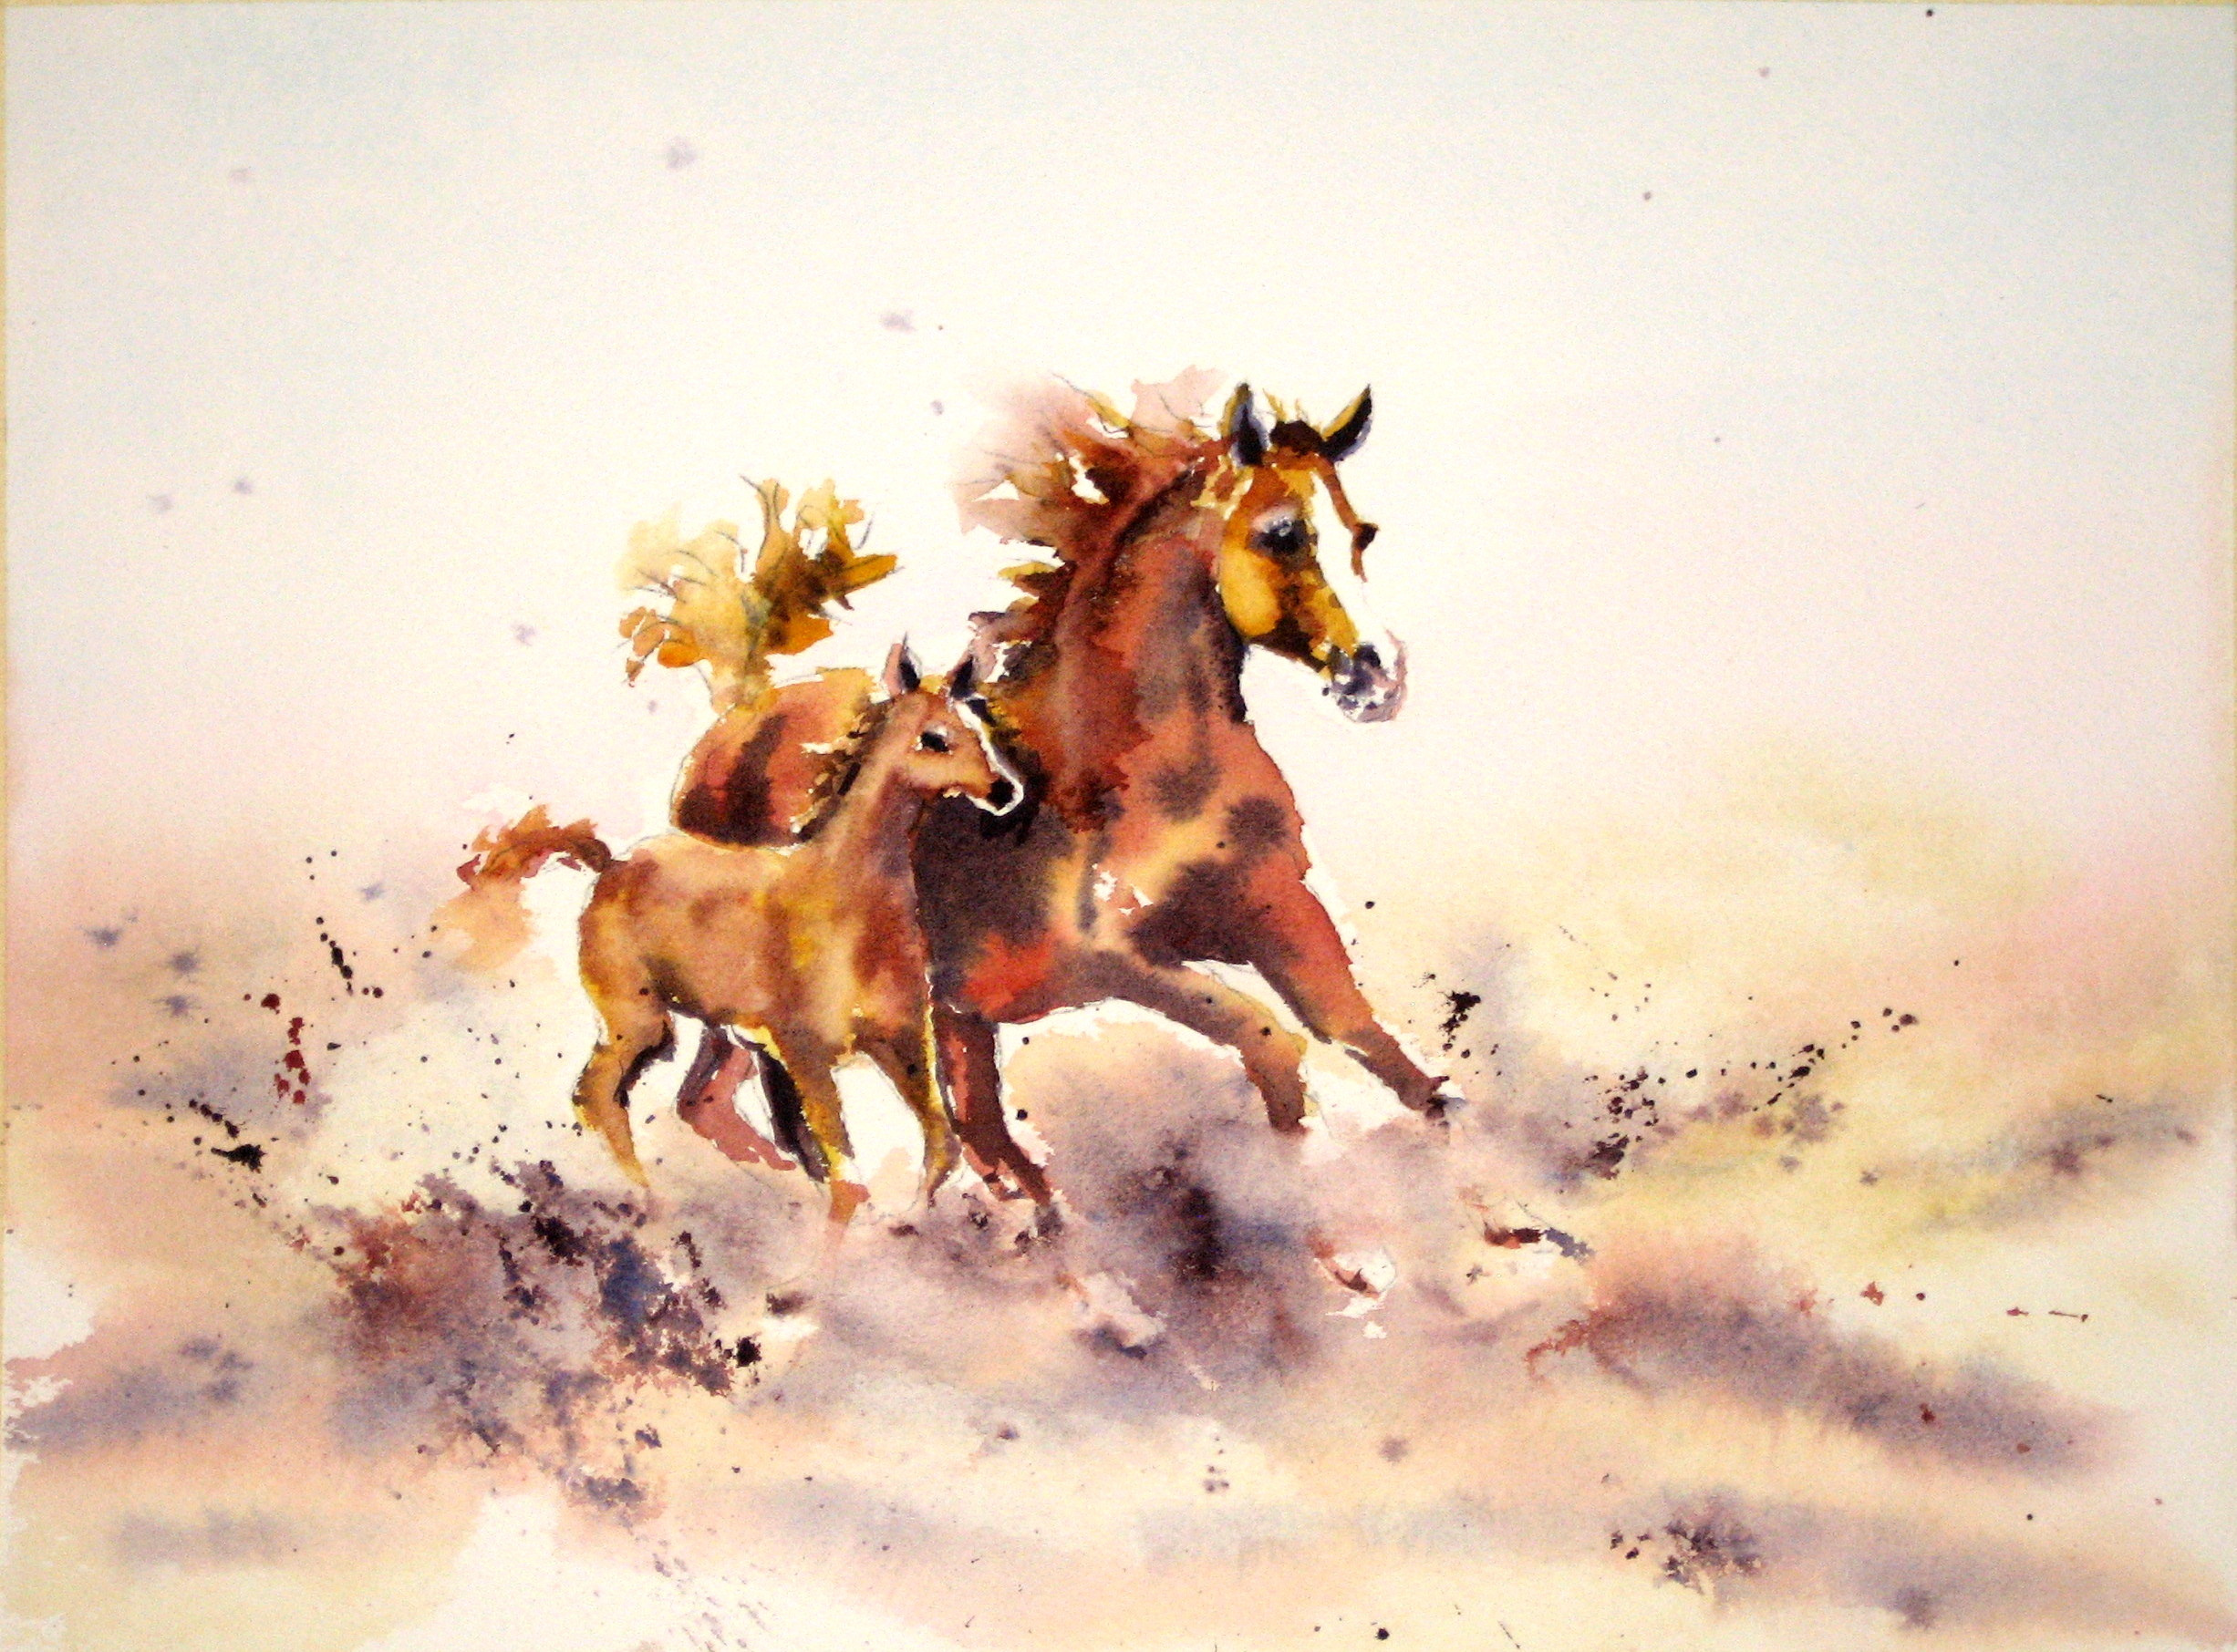 https://0201.nccdn.net/1_2/000/000/179/42c/Running-Horses-2453x1812.jpg